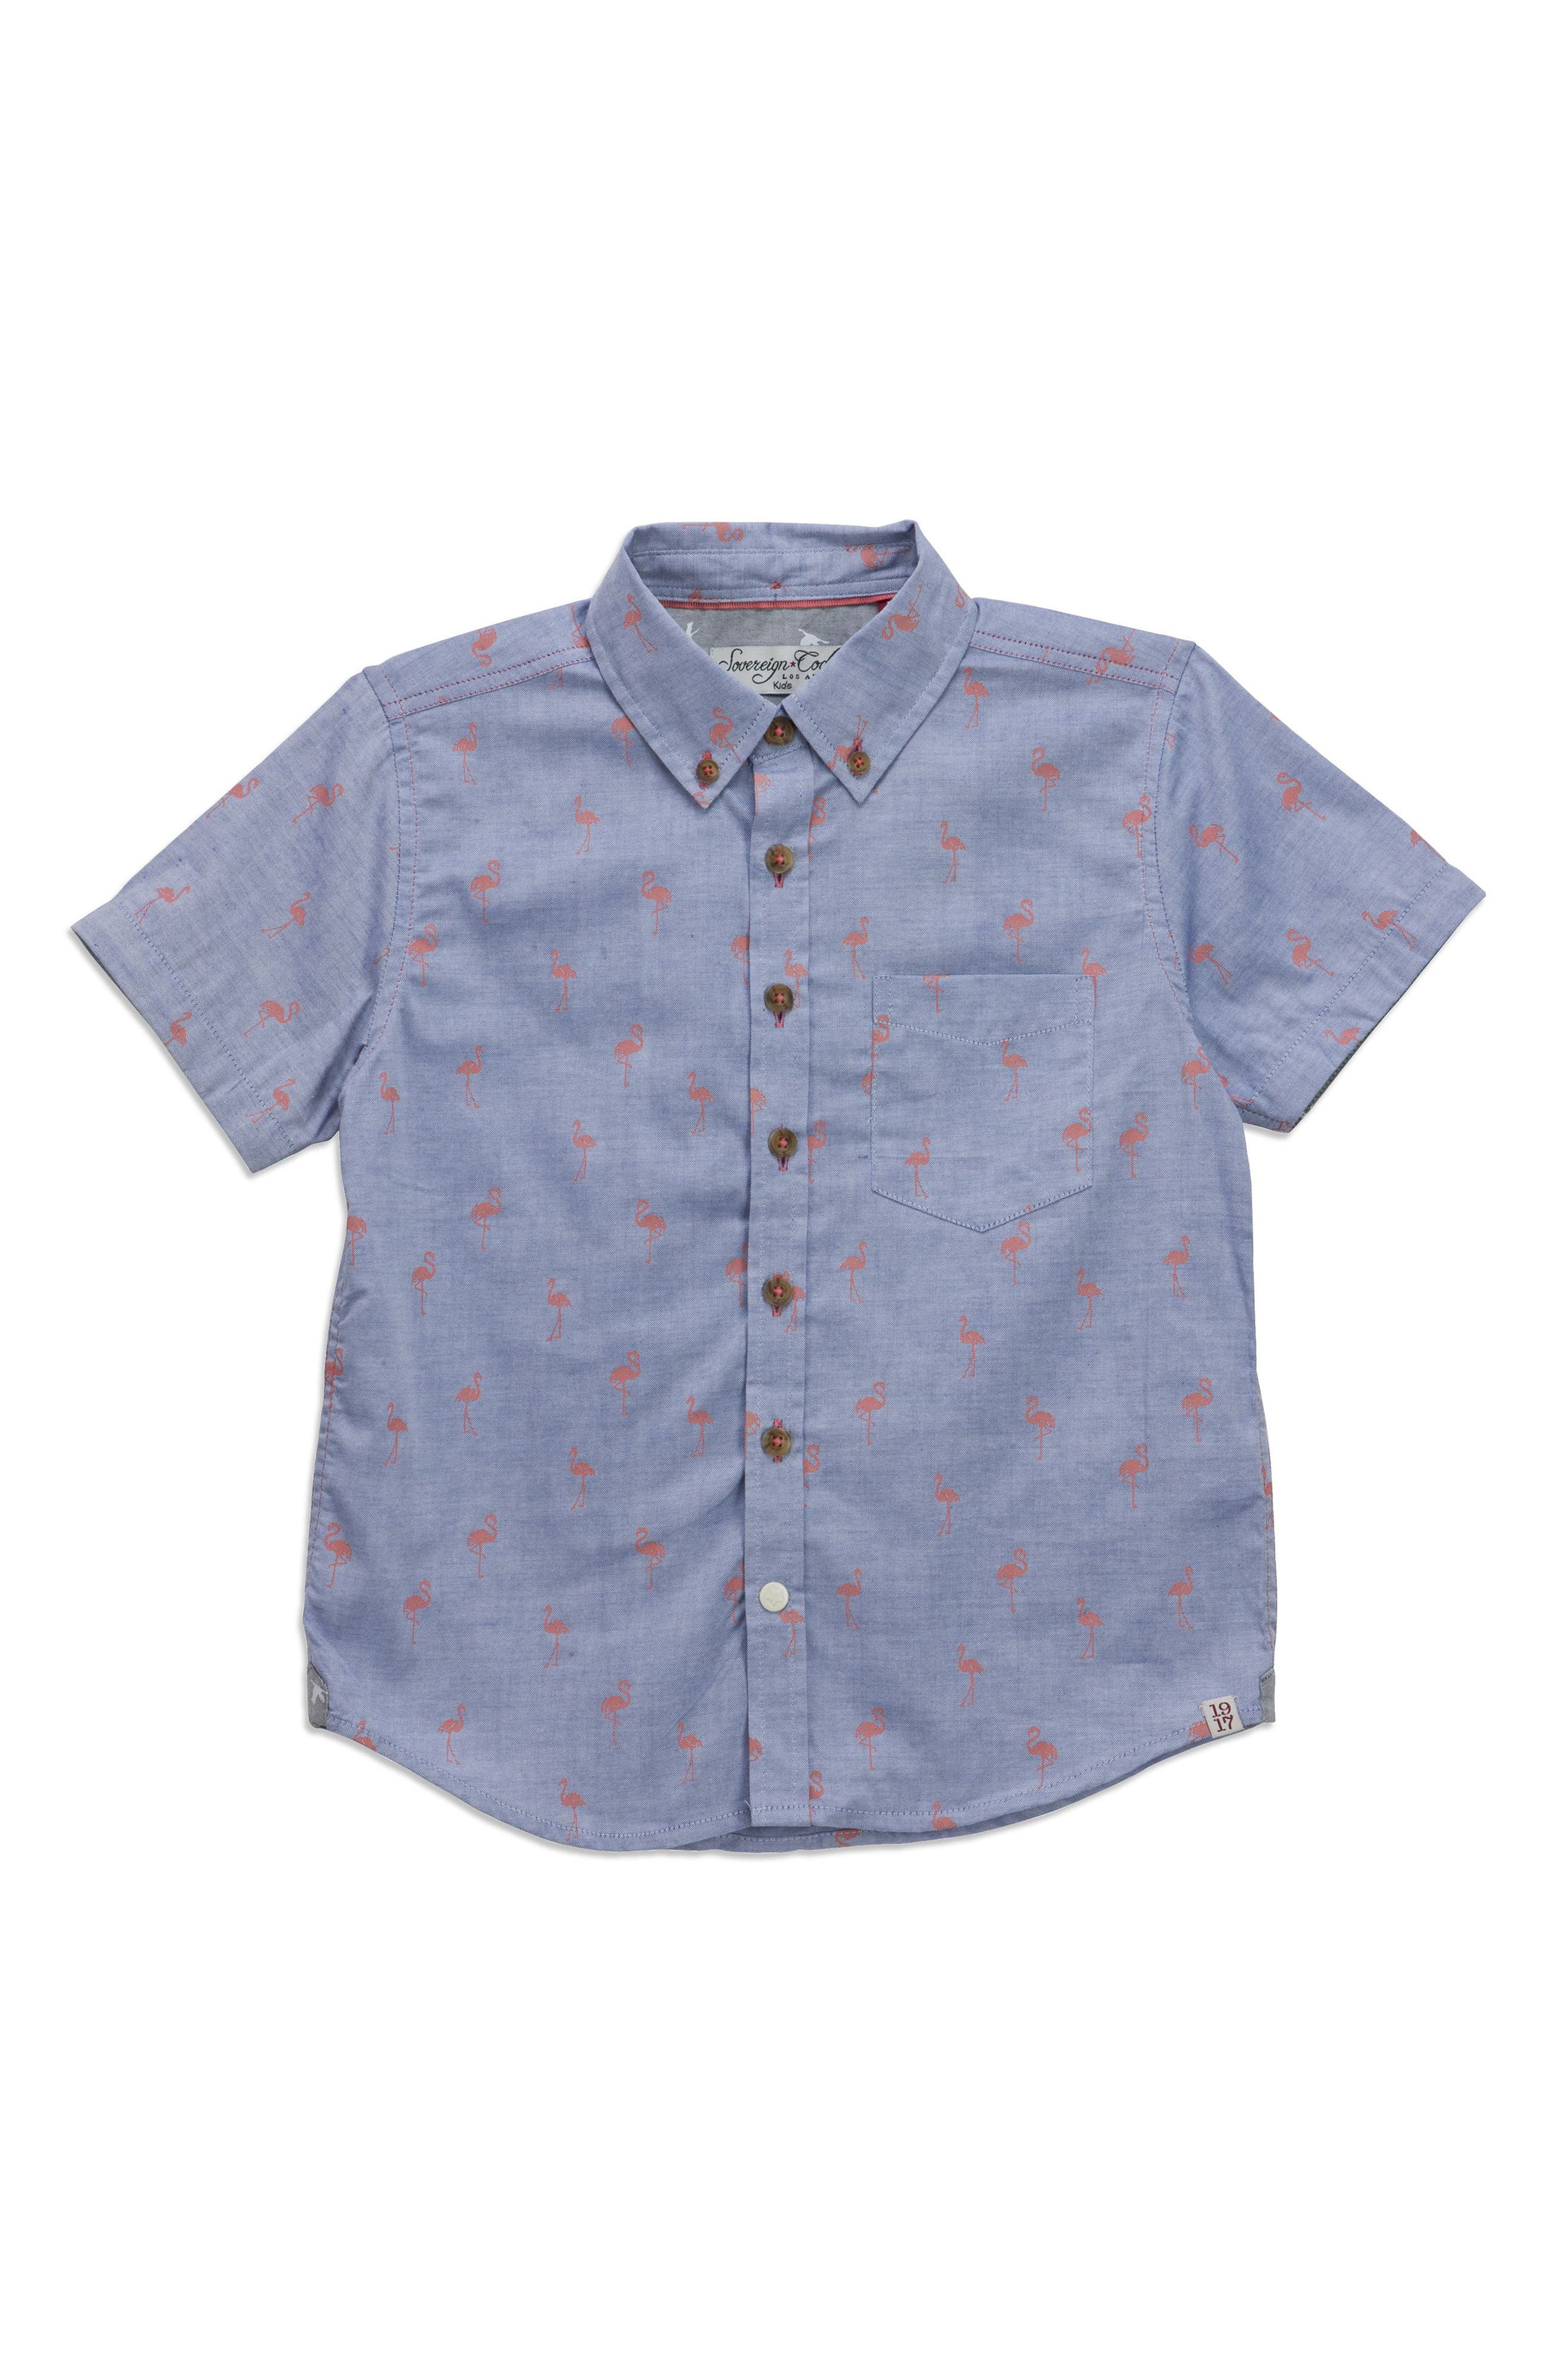 Main Image - Sovereign Code Crystal Cove Woven Shirt (Toddler Boys)